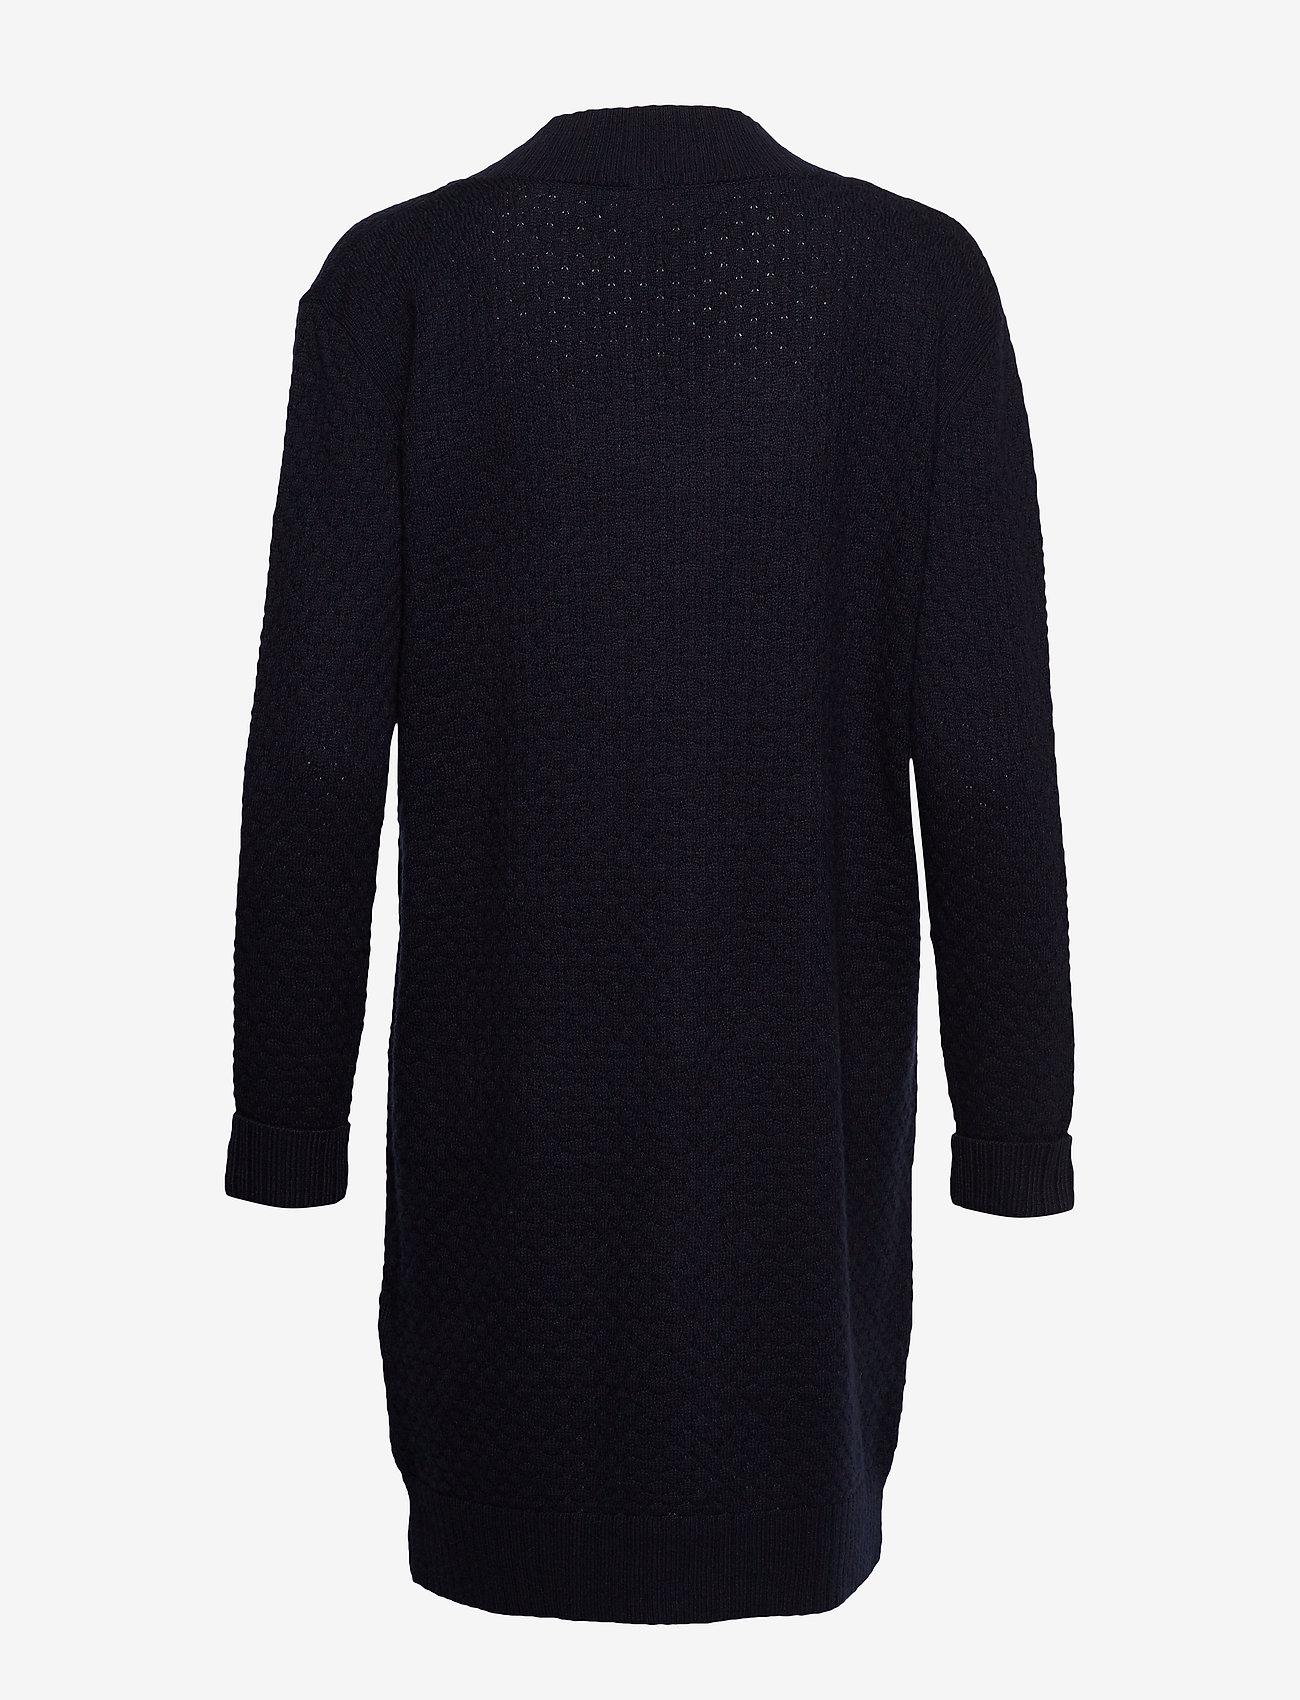 Esprit Casual - Dresses flat knitted - strikkjoler - navy - 1